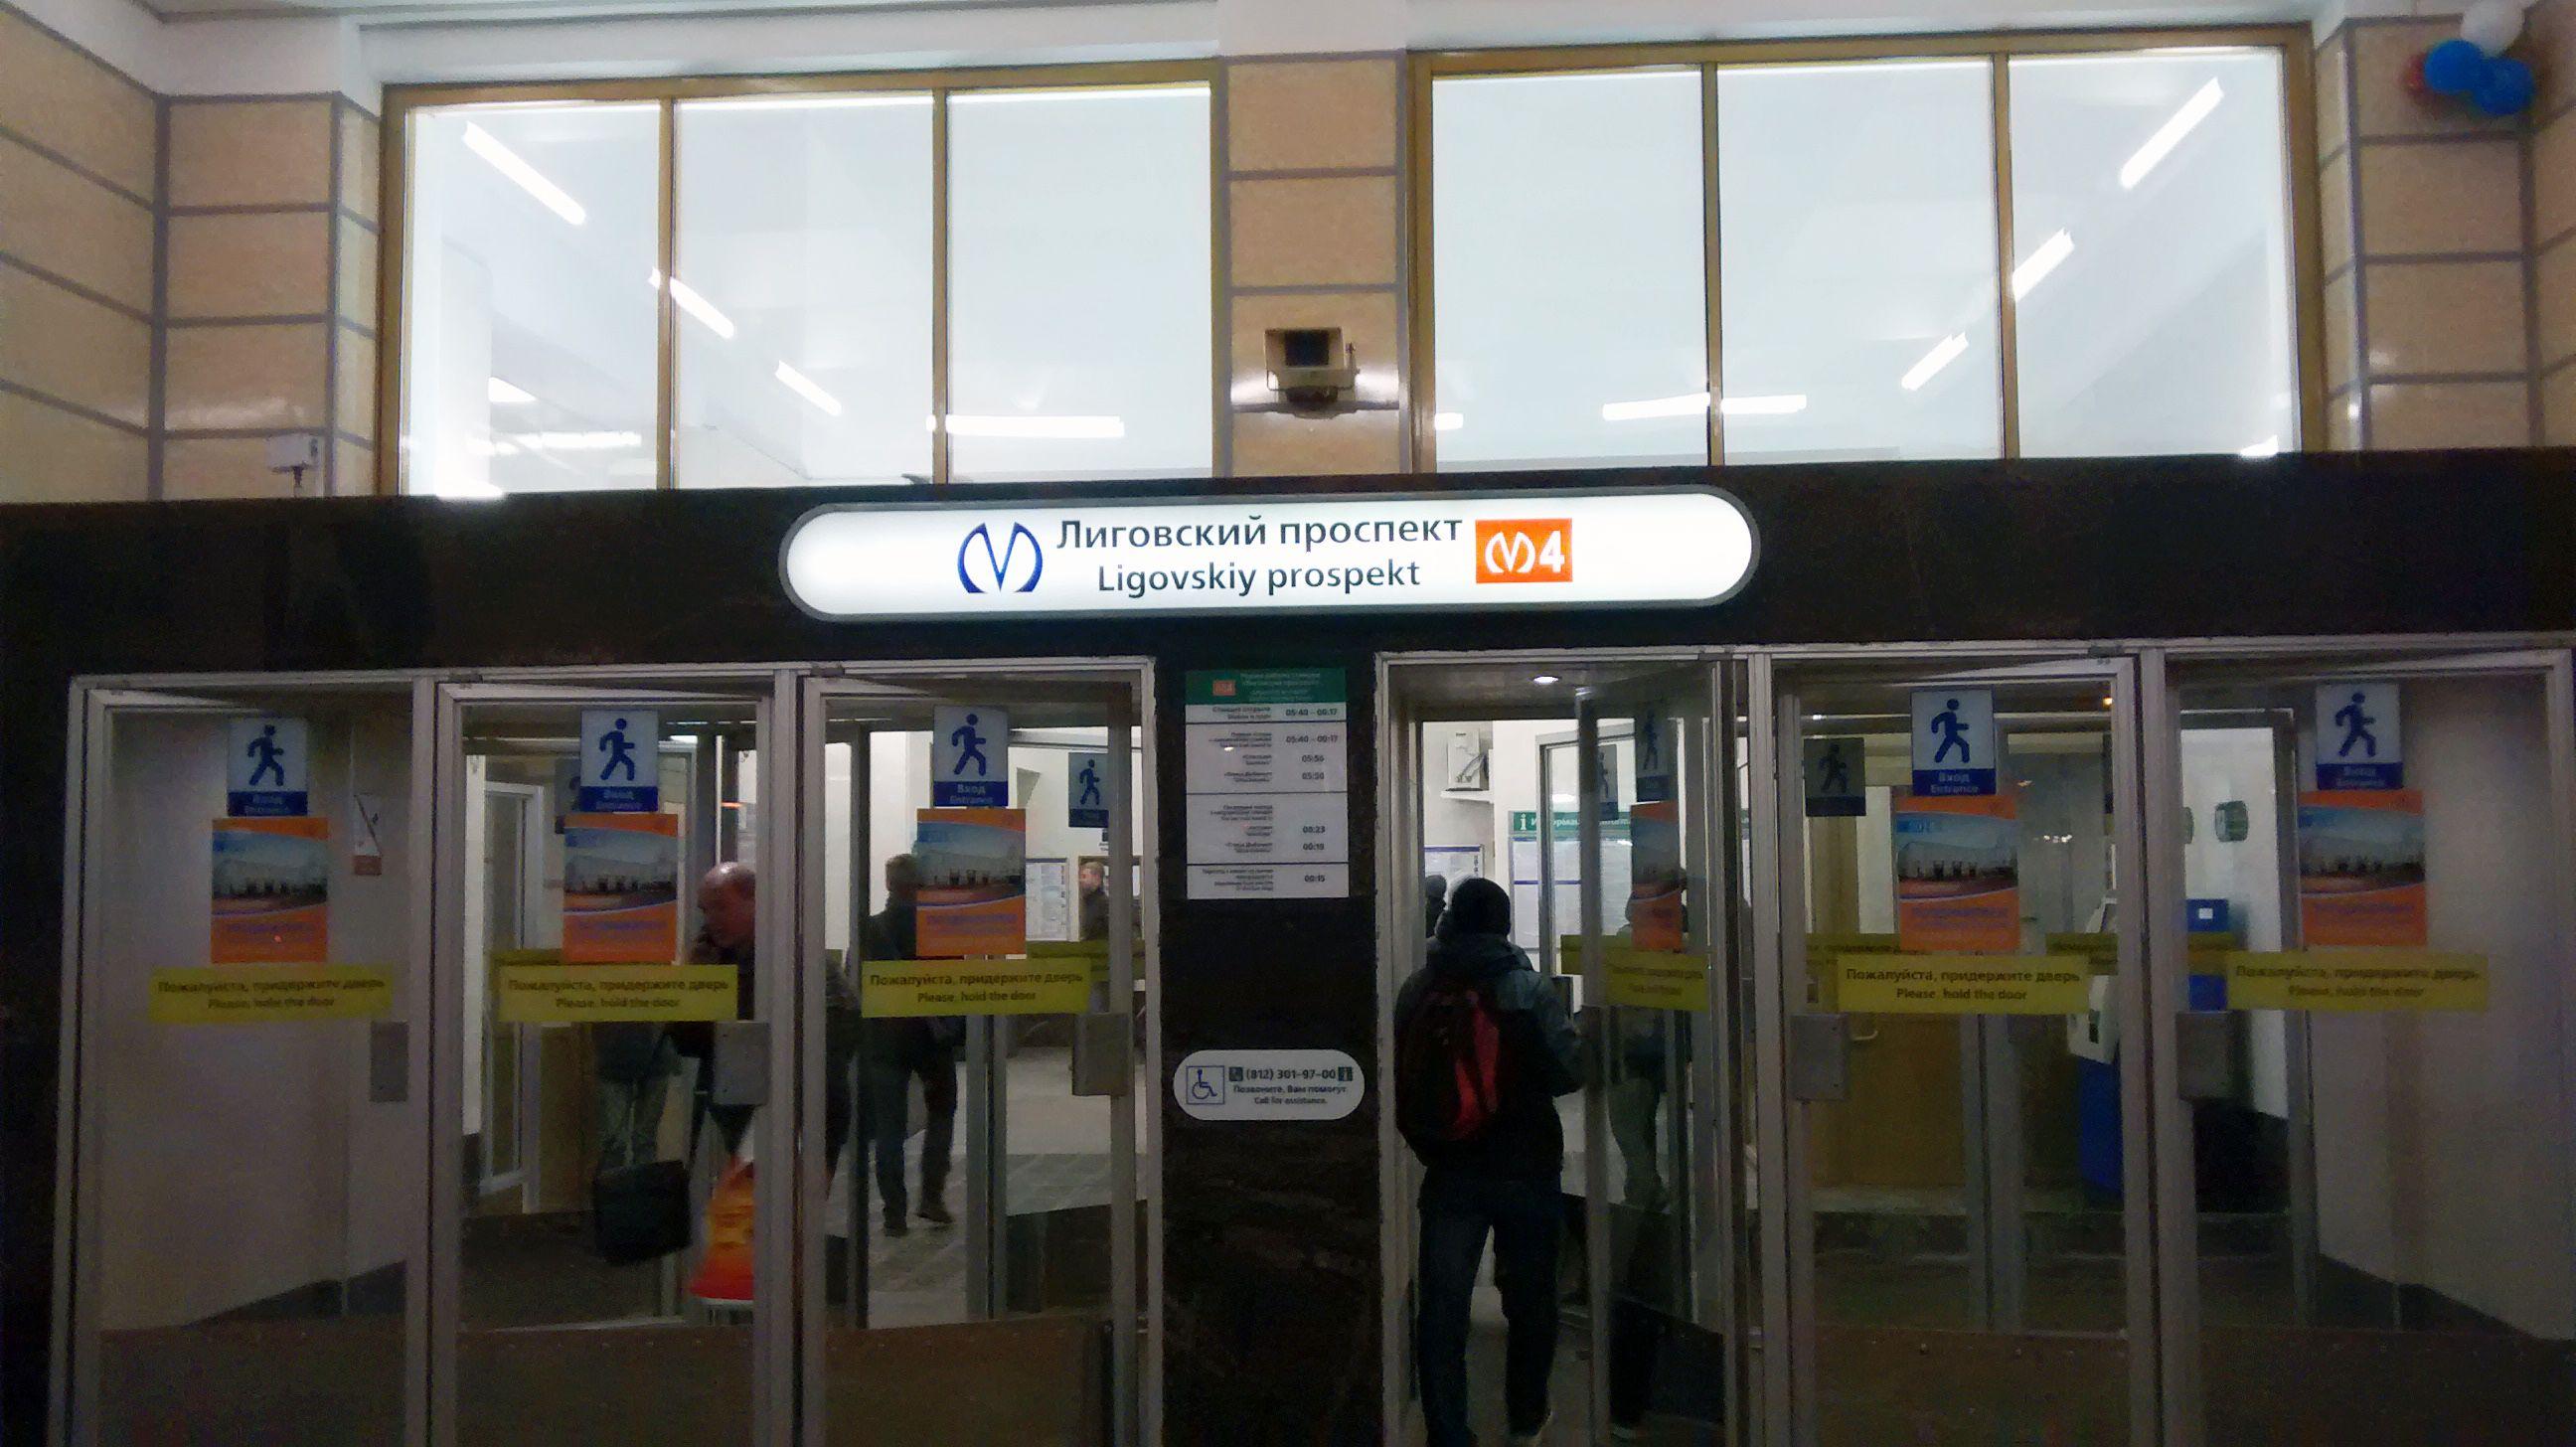 Новостройки возле станции метро Лиговский проспект